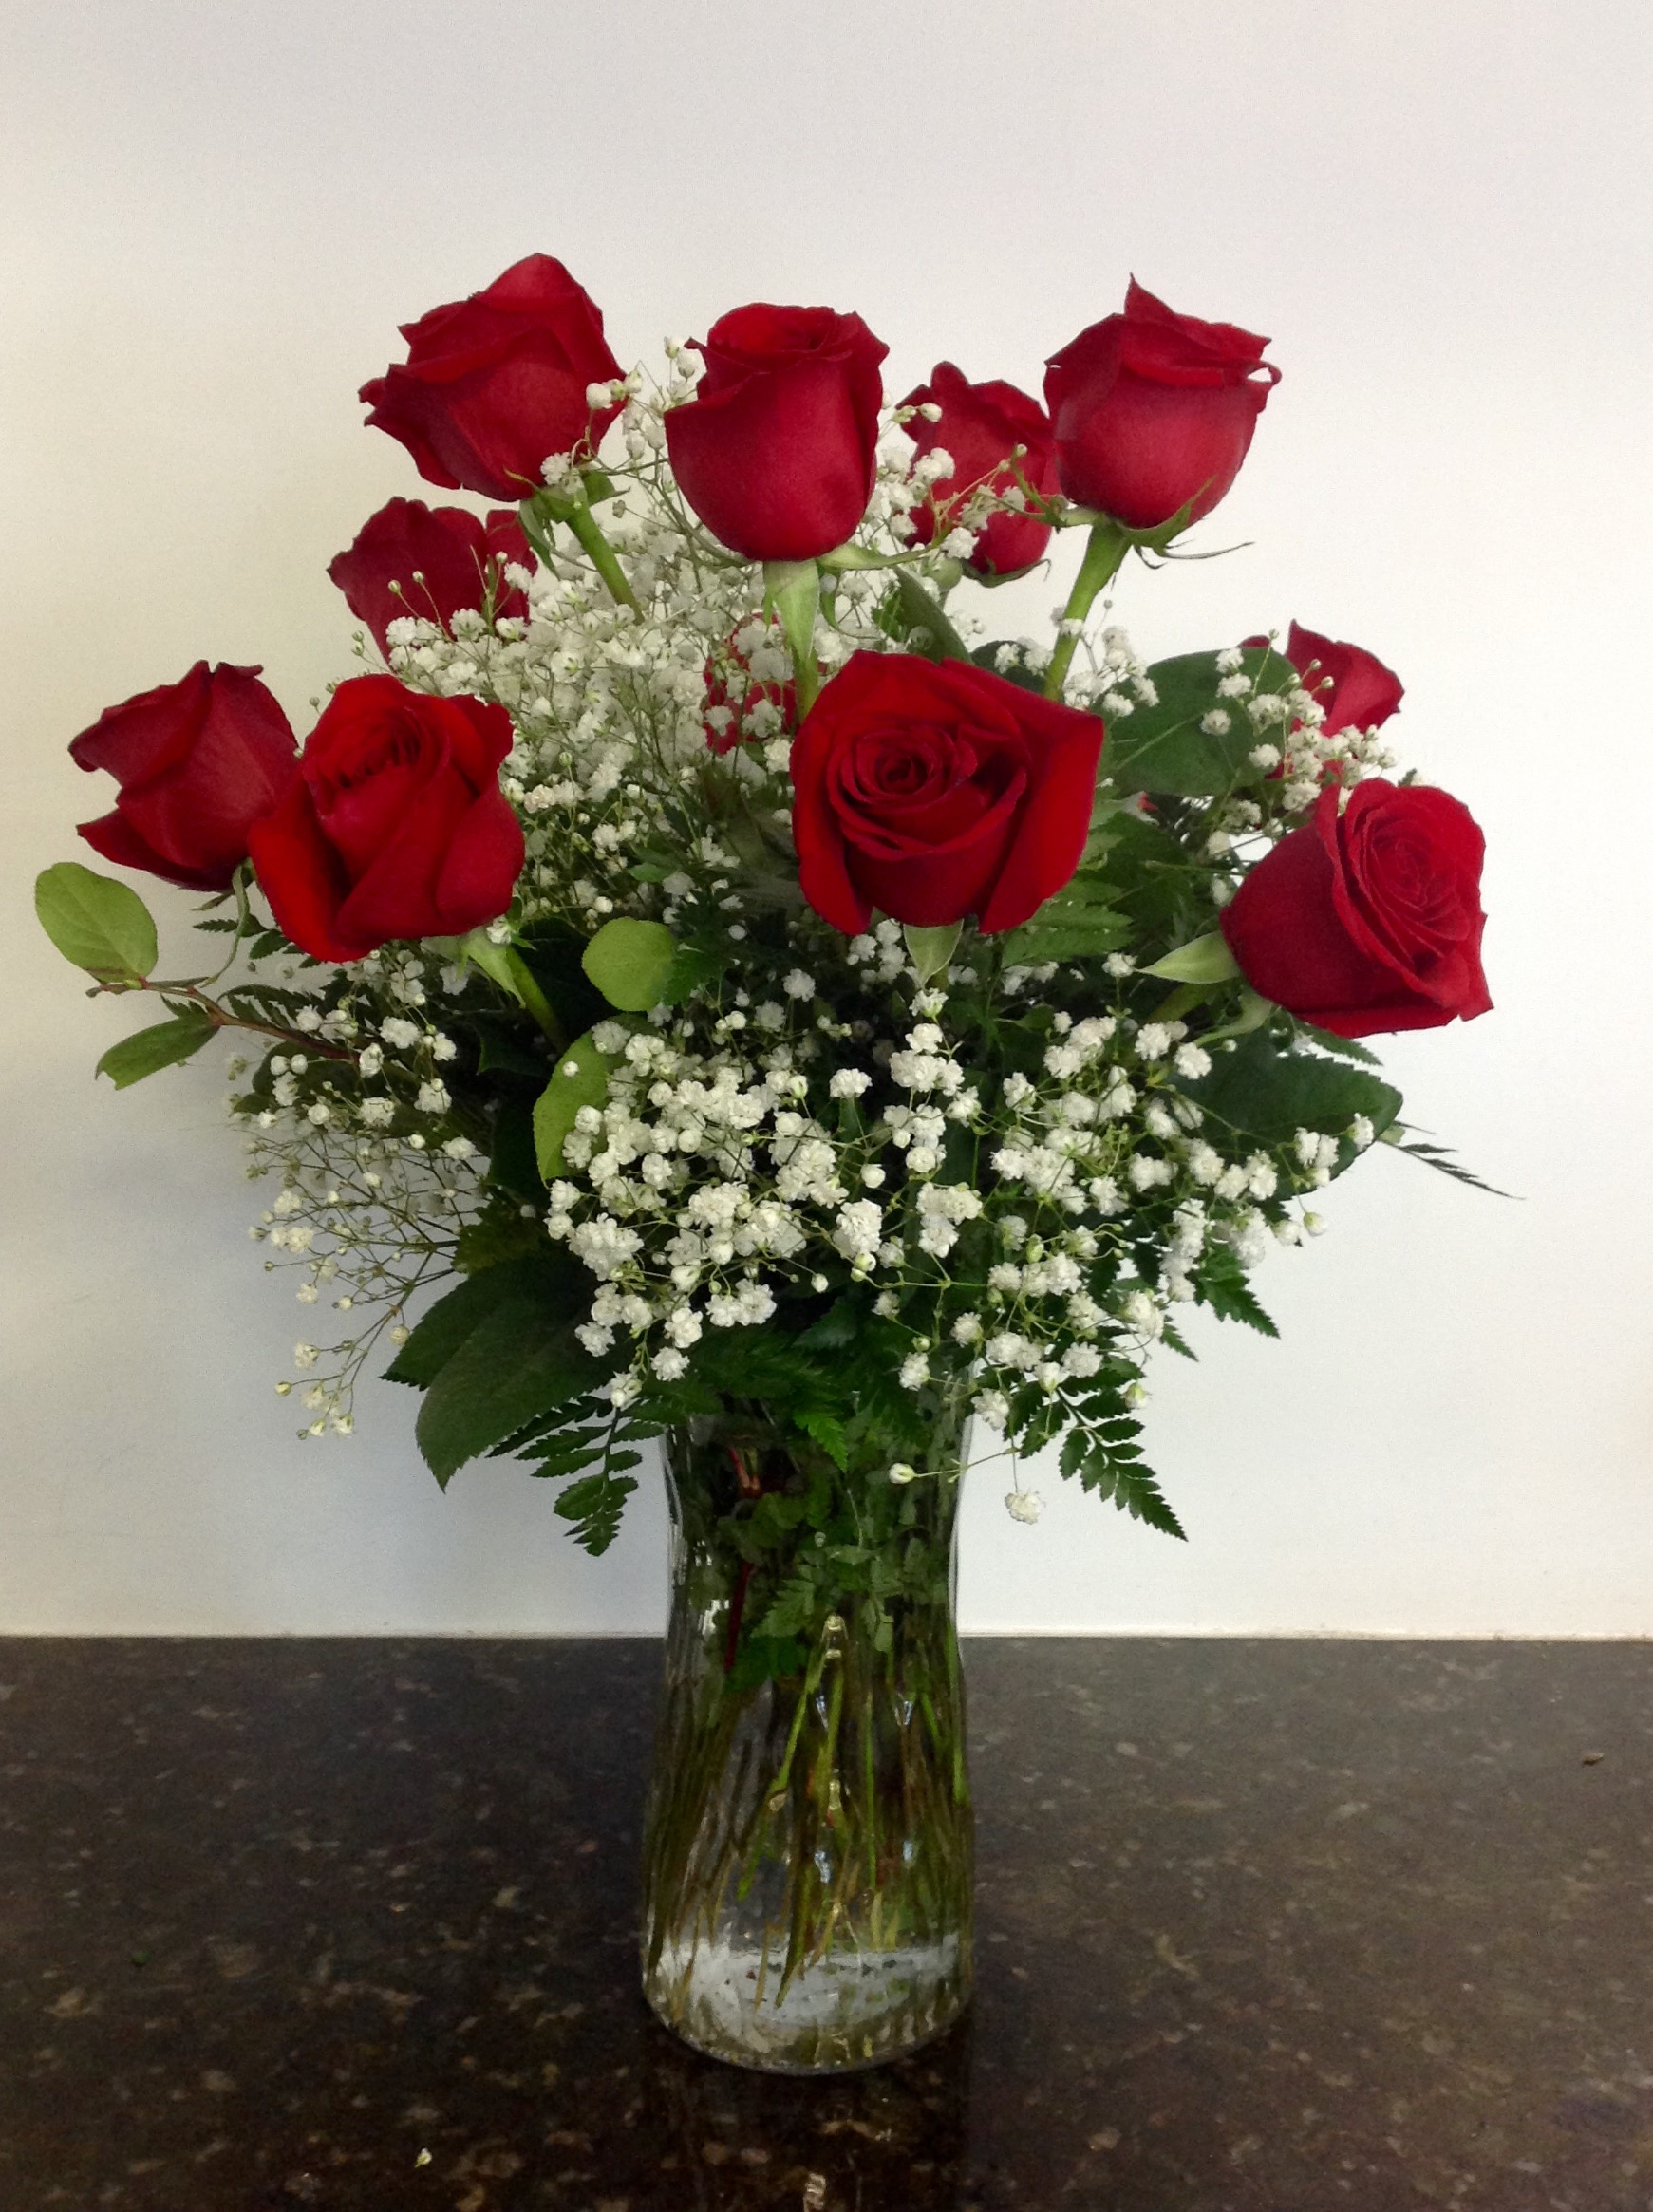 Classic Long Stem Roses - 1/2 dozen $45 • 1 dozen $75 • 2 dozen $150